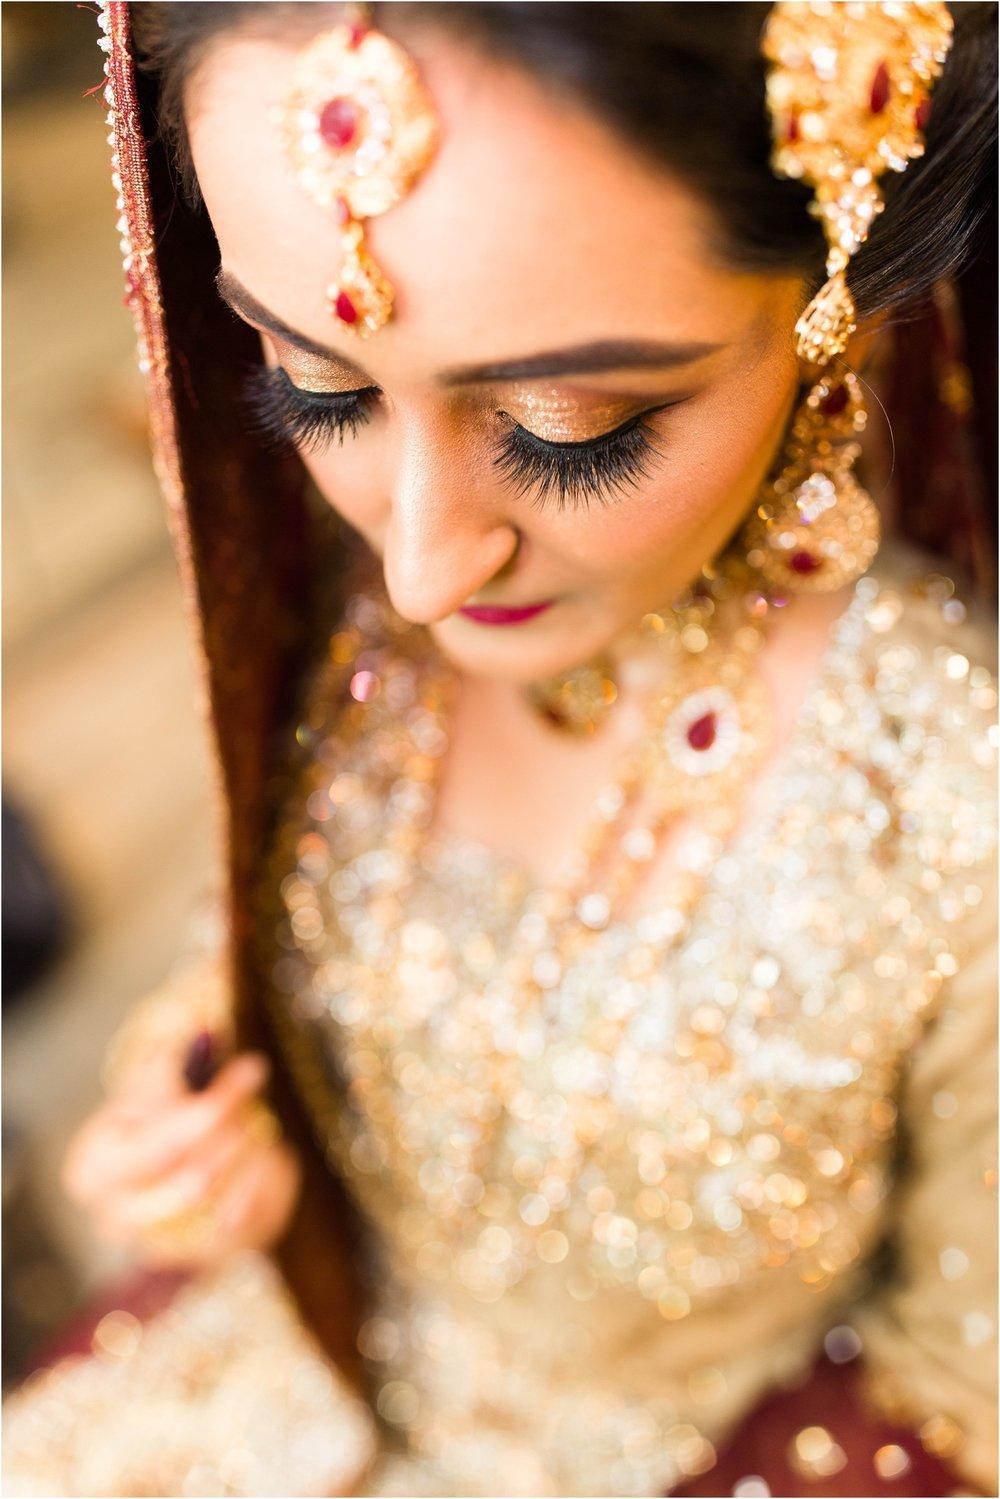 Scarborough-Convention-Centre-Baraat-Toronto-Mississauga-Brampton-Scarborough-GTA-Pakistani-Indian-Wedding-Engagement-Photographer-Photography_0010.jpg